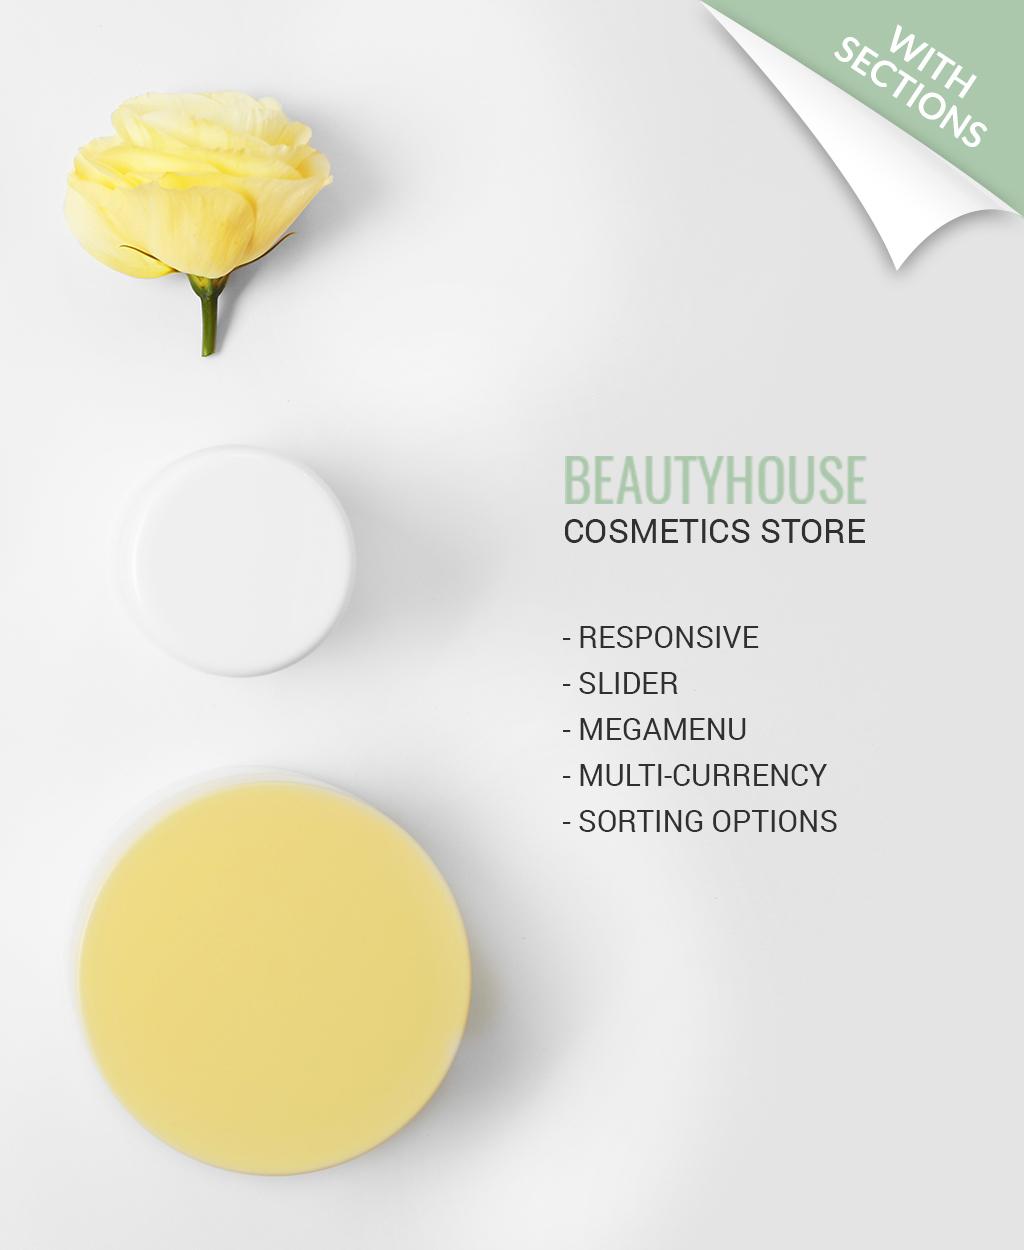 BeautyHouse - Cosmetics Store Shopify Theme - screenshot